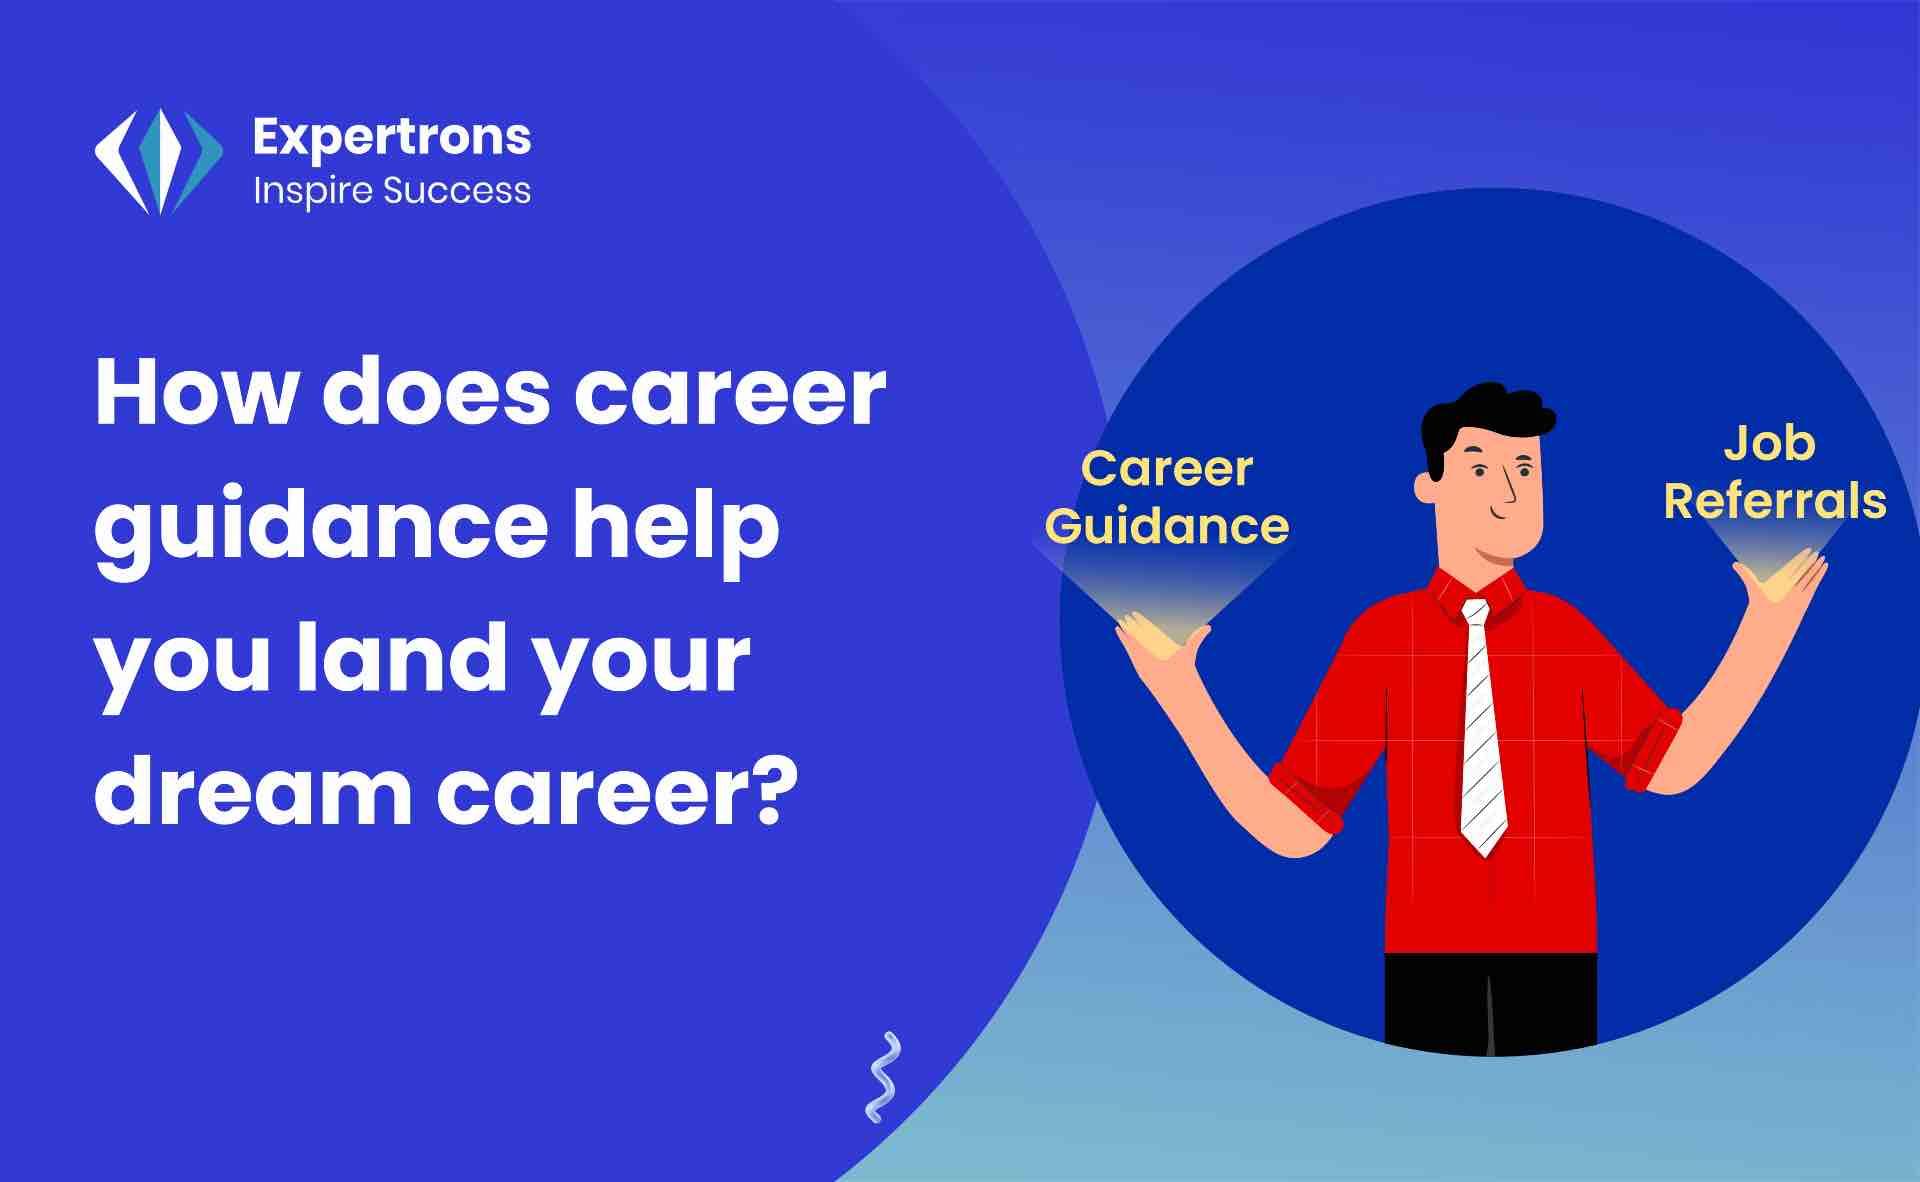 online career guidance, career guidance session, comprehensive career development, online career guidance, professional career guidance, professional training, career development, career path, Resume building training, mock interviews